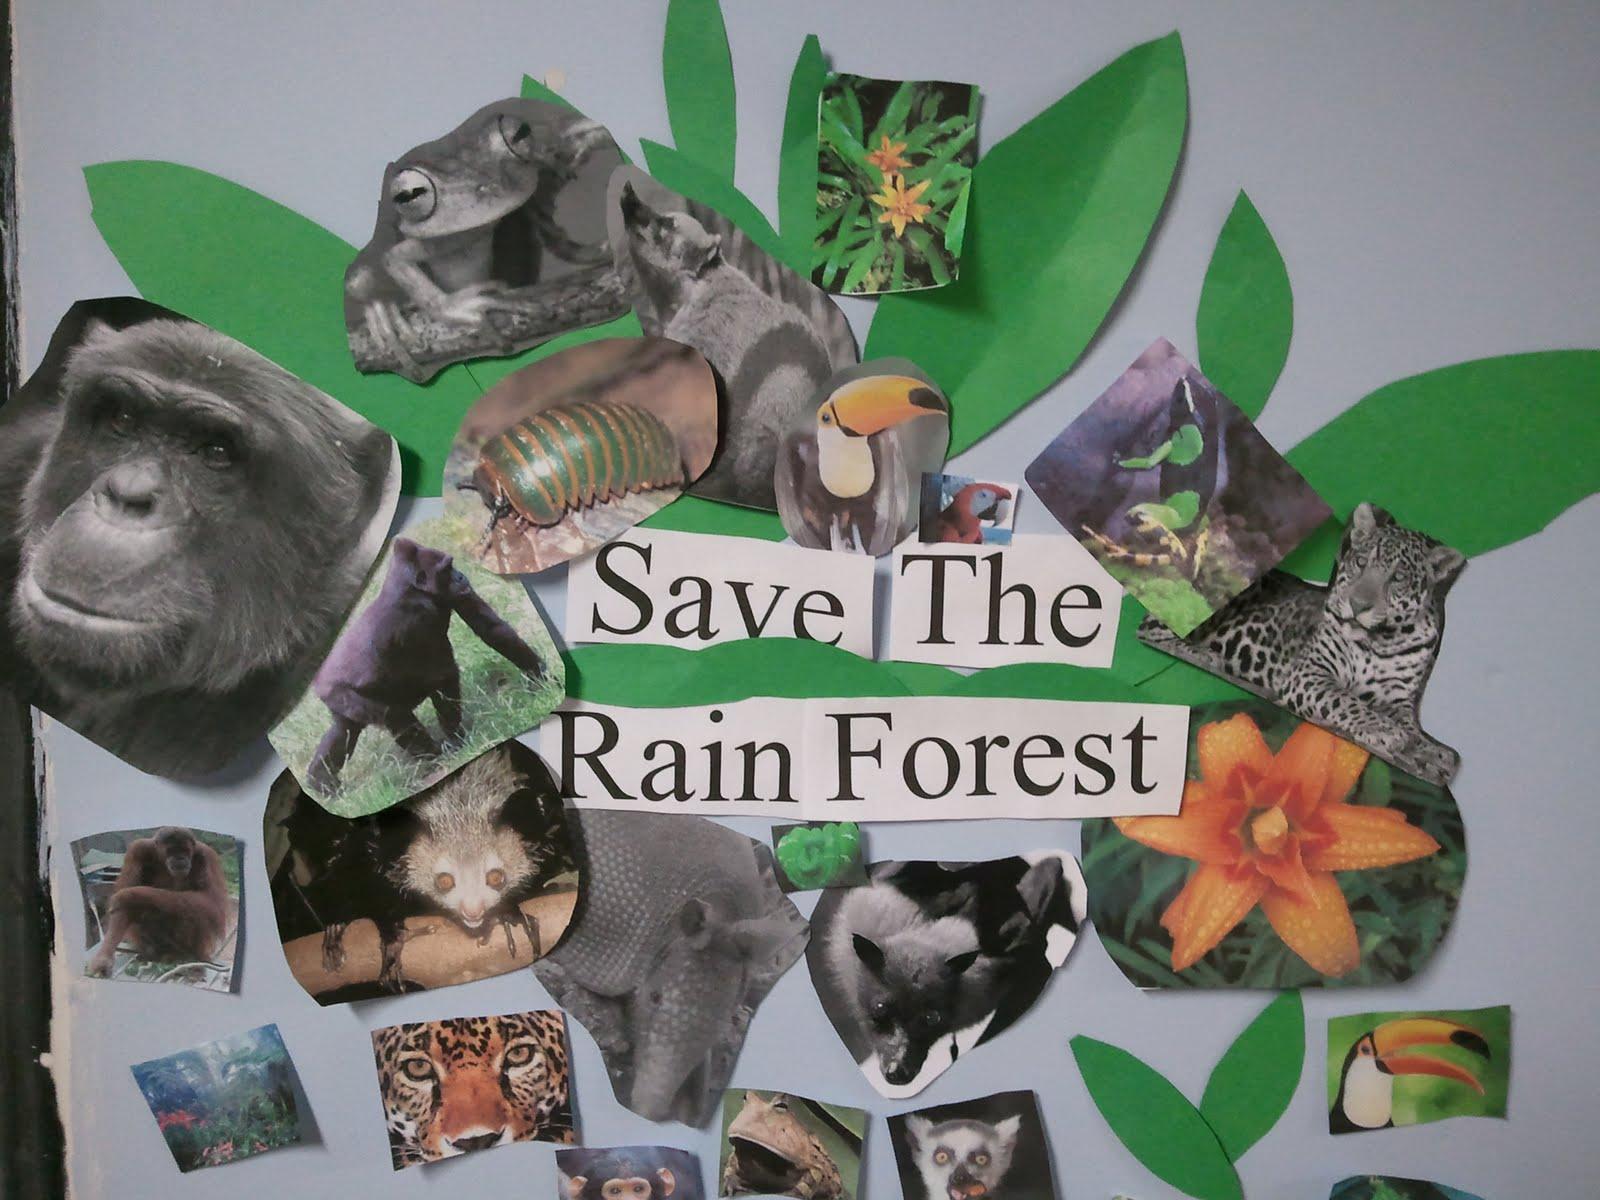 amazon rainforest plants collage. the amazon rainforest plants collage